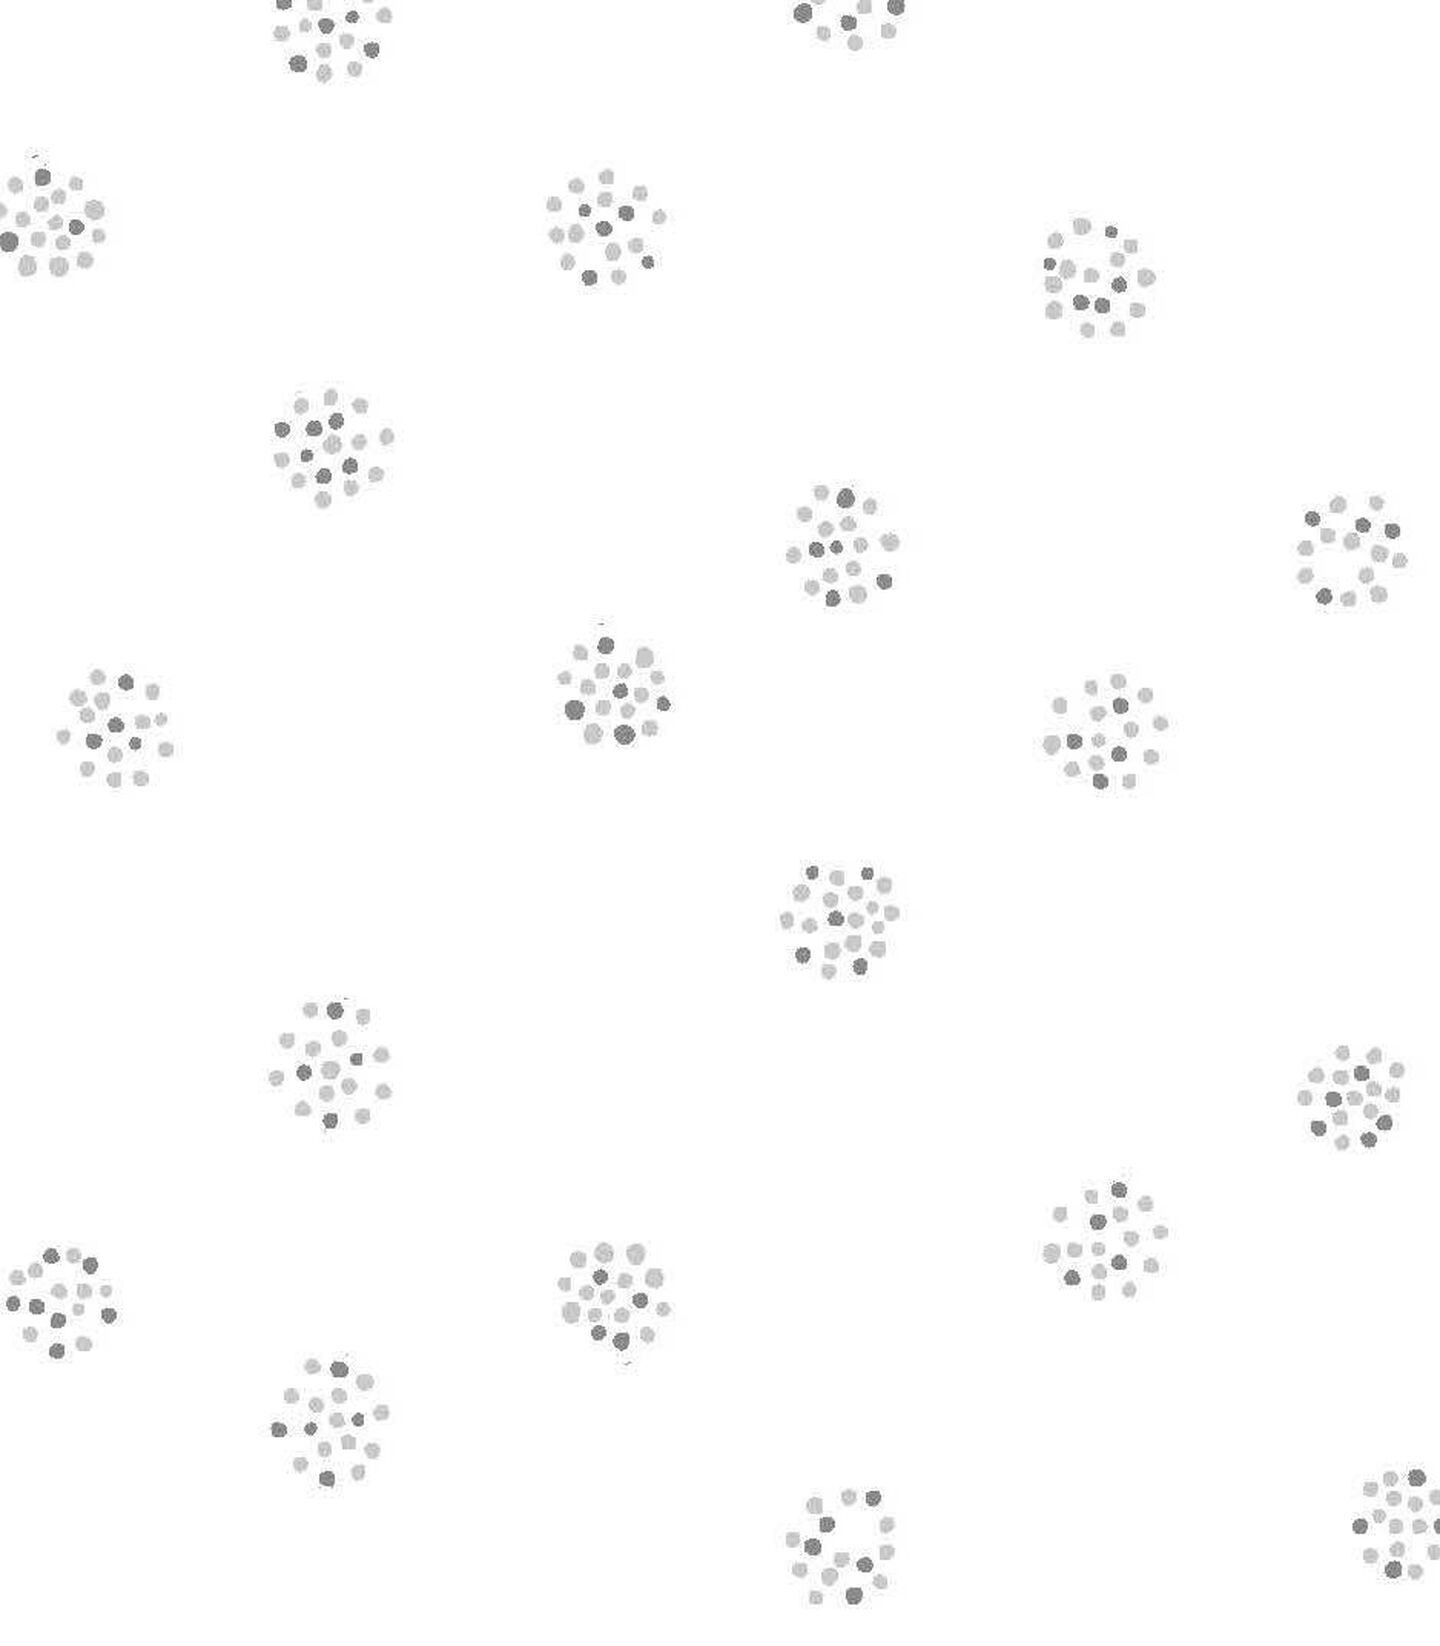 Petit-Pehr Dotty print for Stokke. Pattern detail.